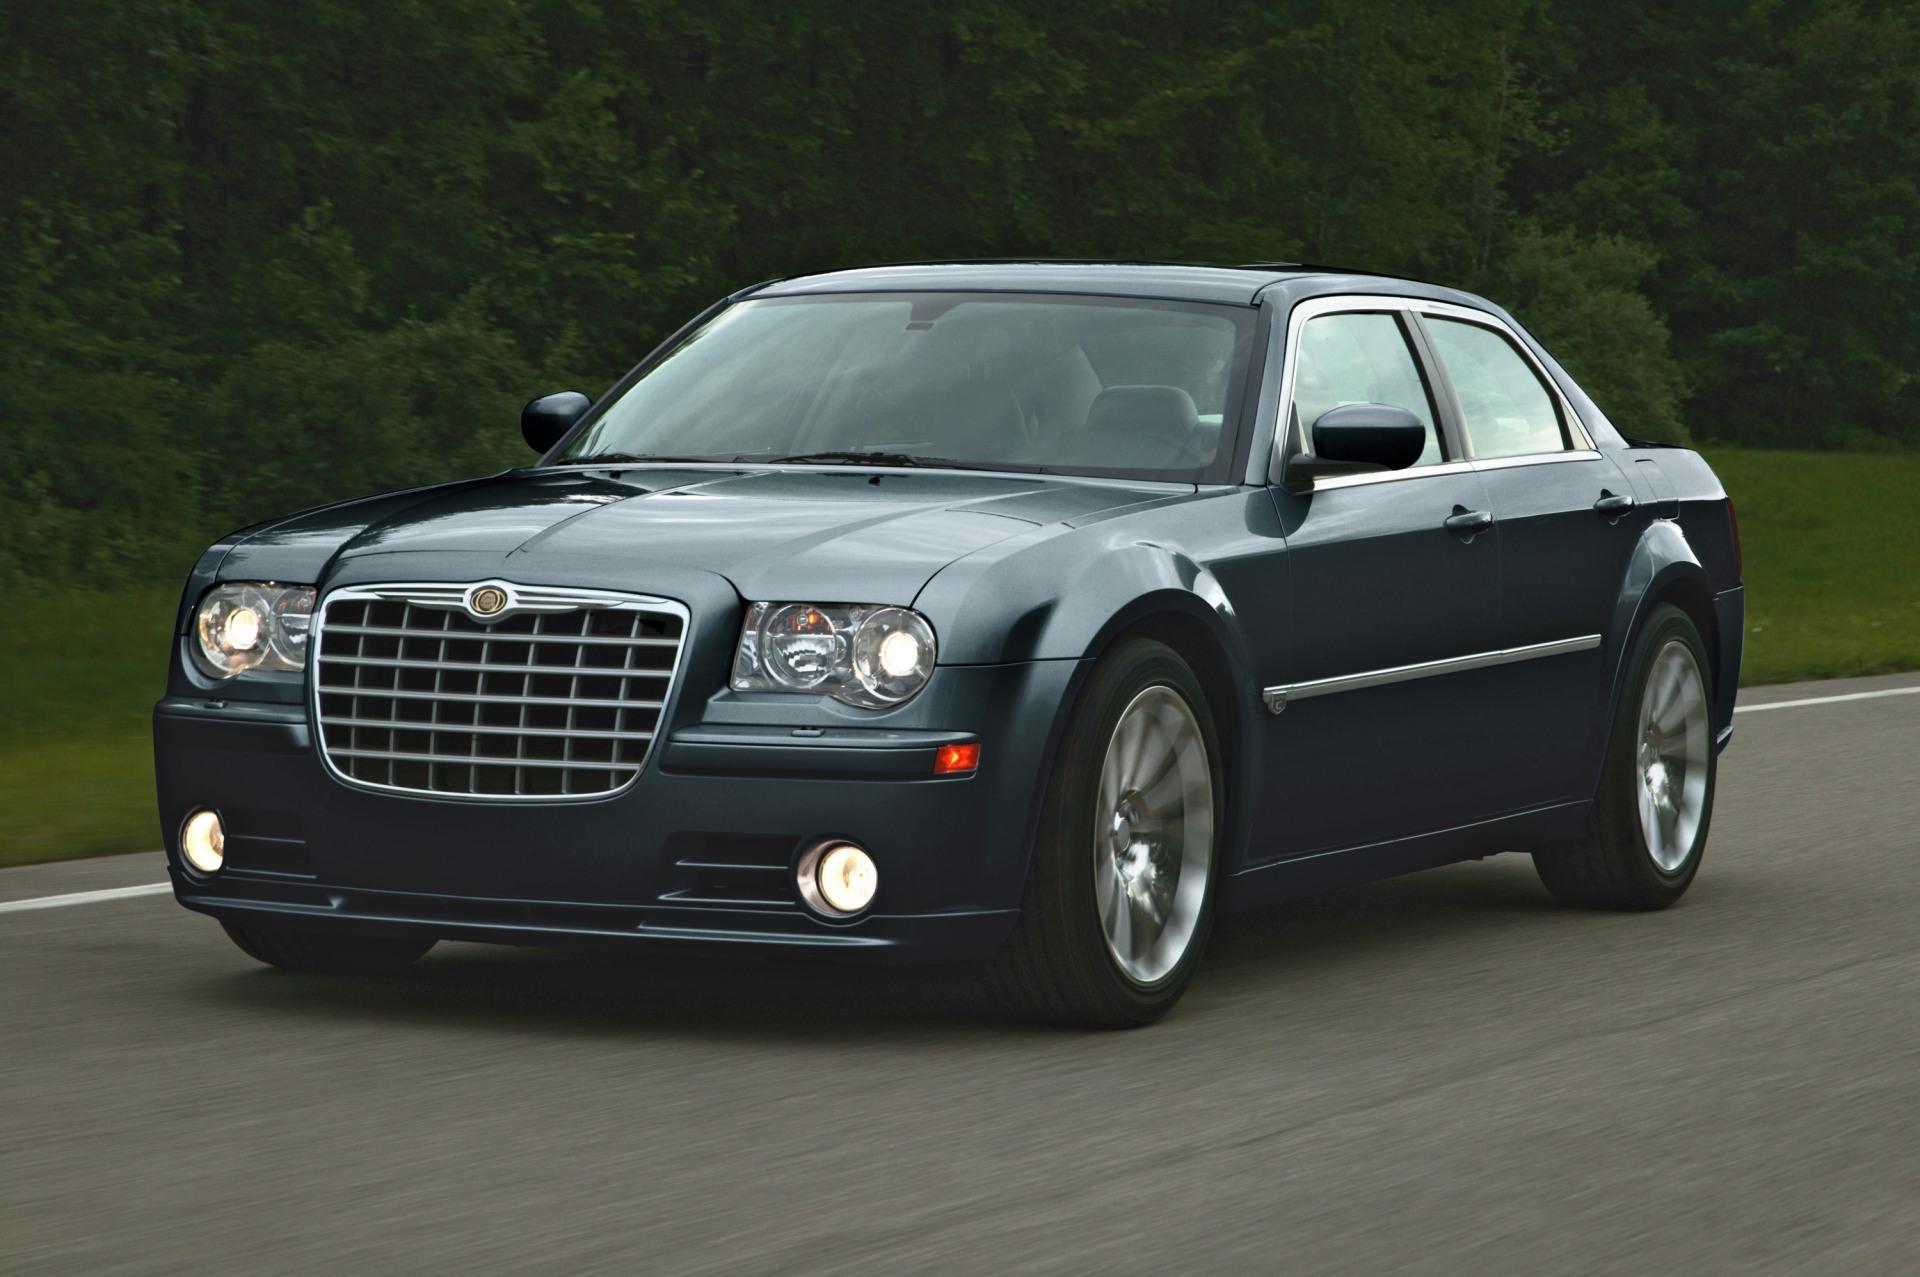 Chrysler 300 Convertible >> 2009 Chrysler 300 News and Information | conceptcarz.com